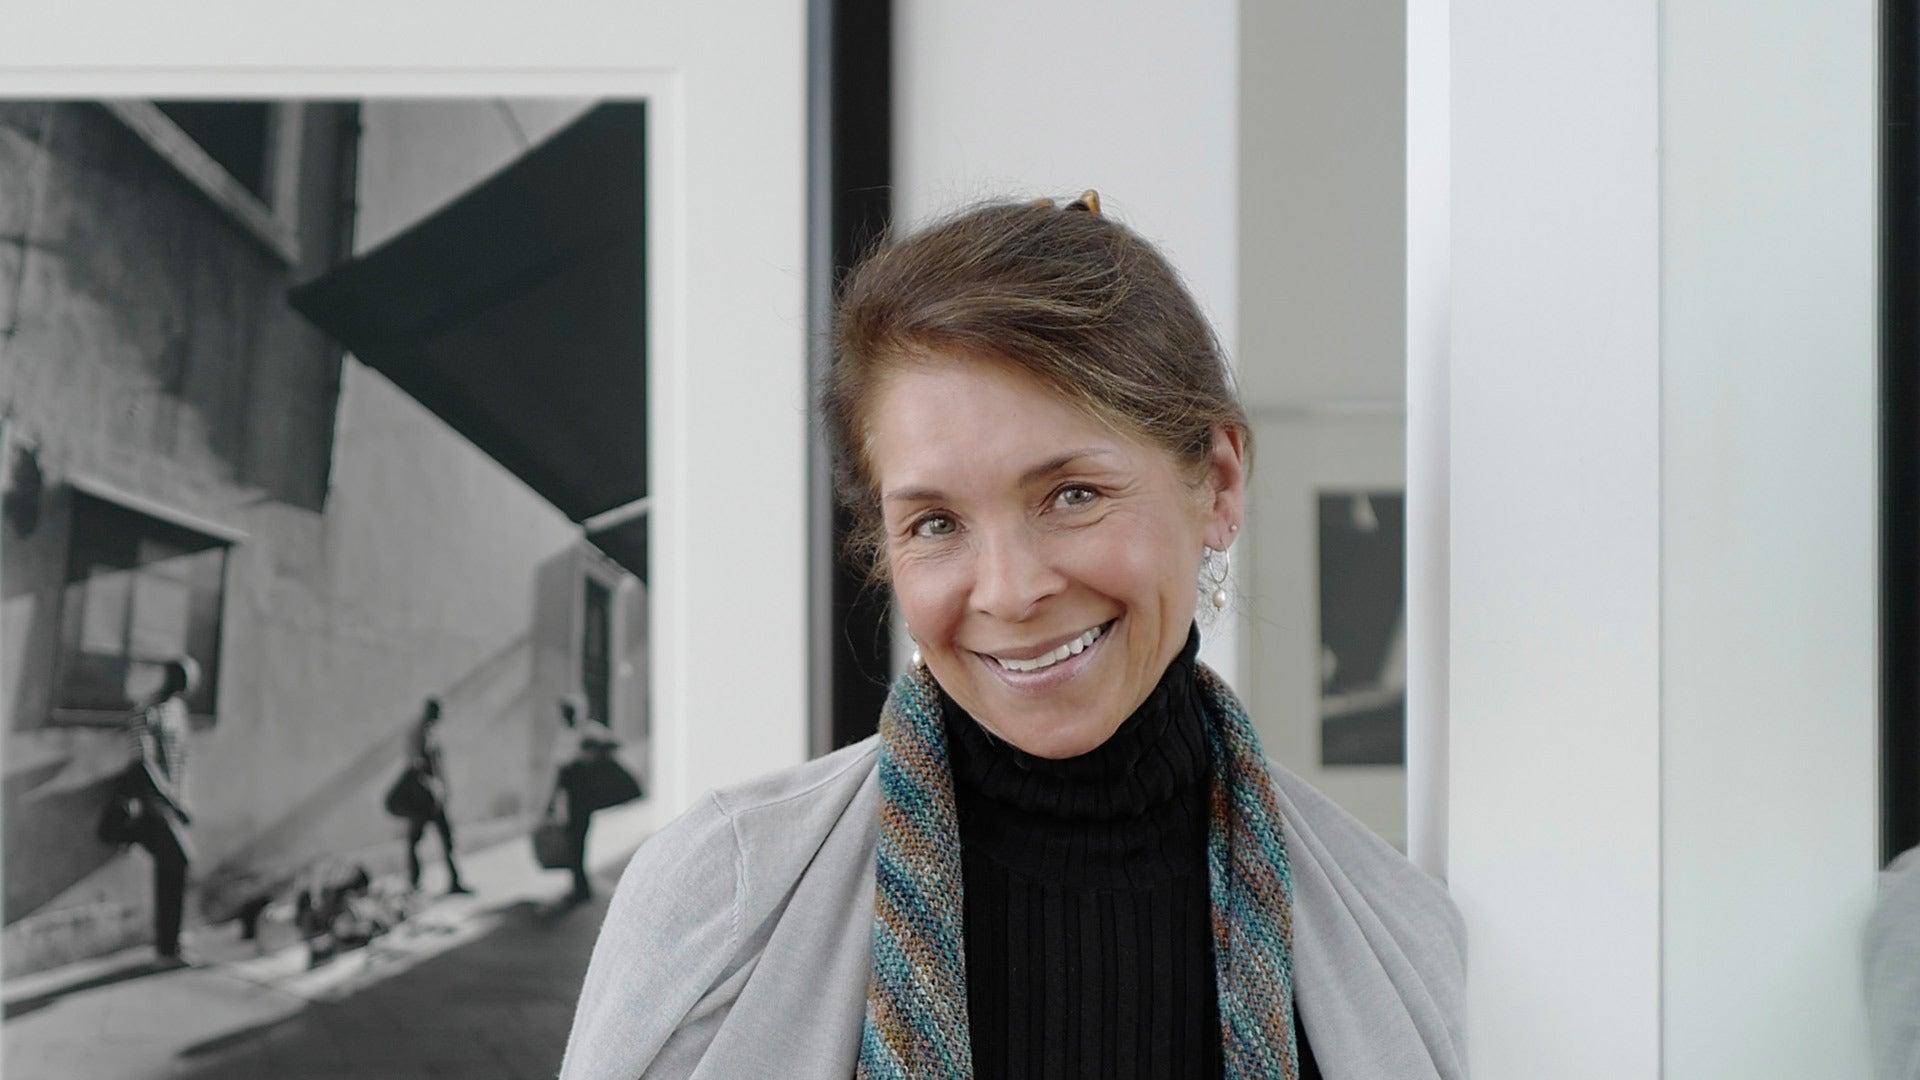 photo of Jeanne Moutoussamy-Ashe